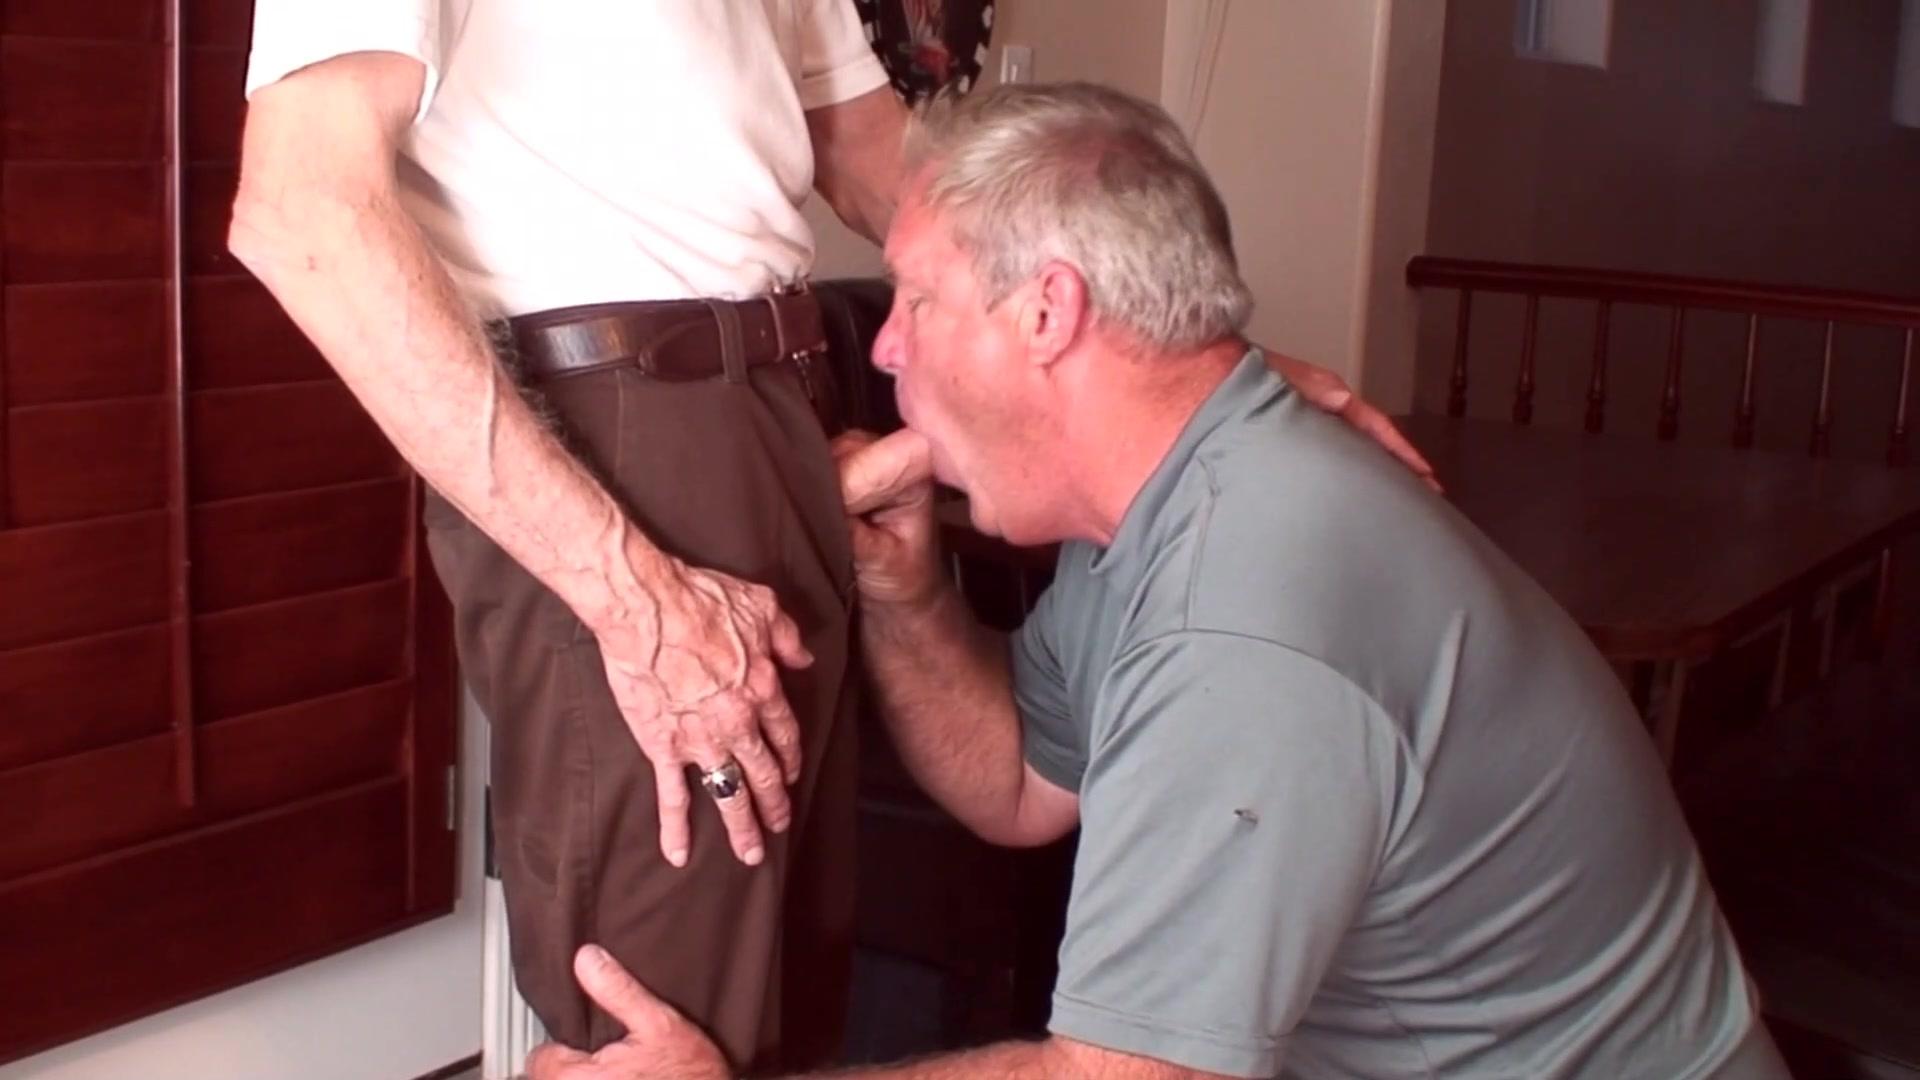 guy-porn-videos-no-membership-sex-position-guide